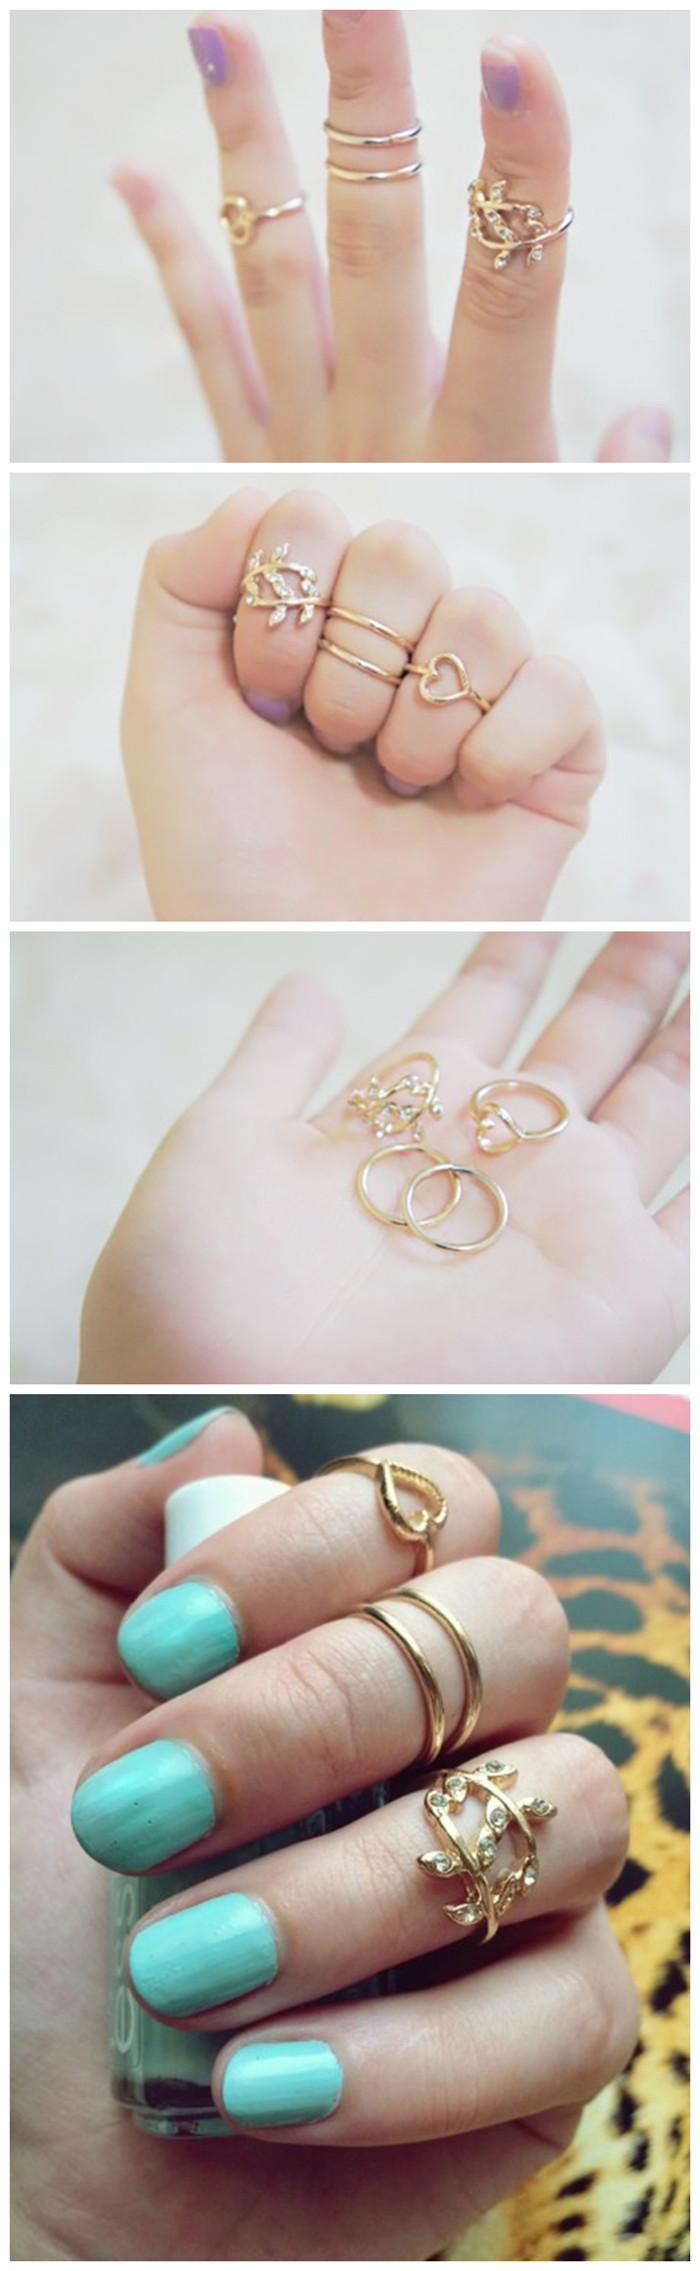 $2.83 4Pcs/set Ring Cute Heart & Leaf Shaped Ring Boho Ring Gold Plated Ring - BornPrettyStore.com